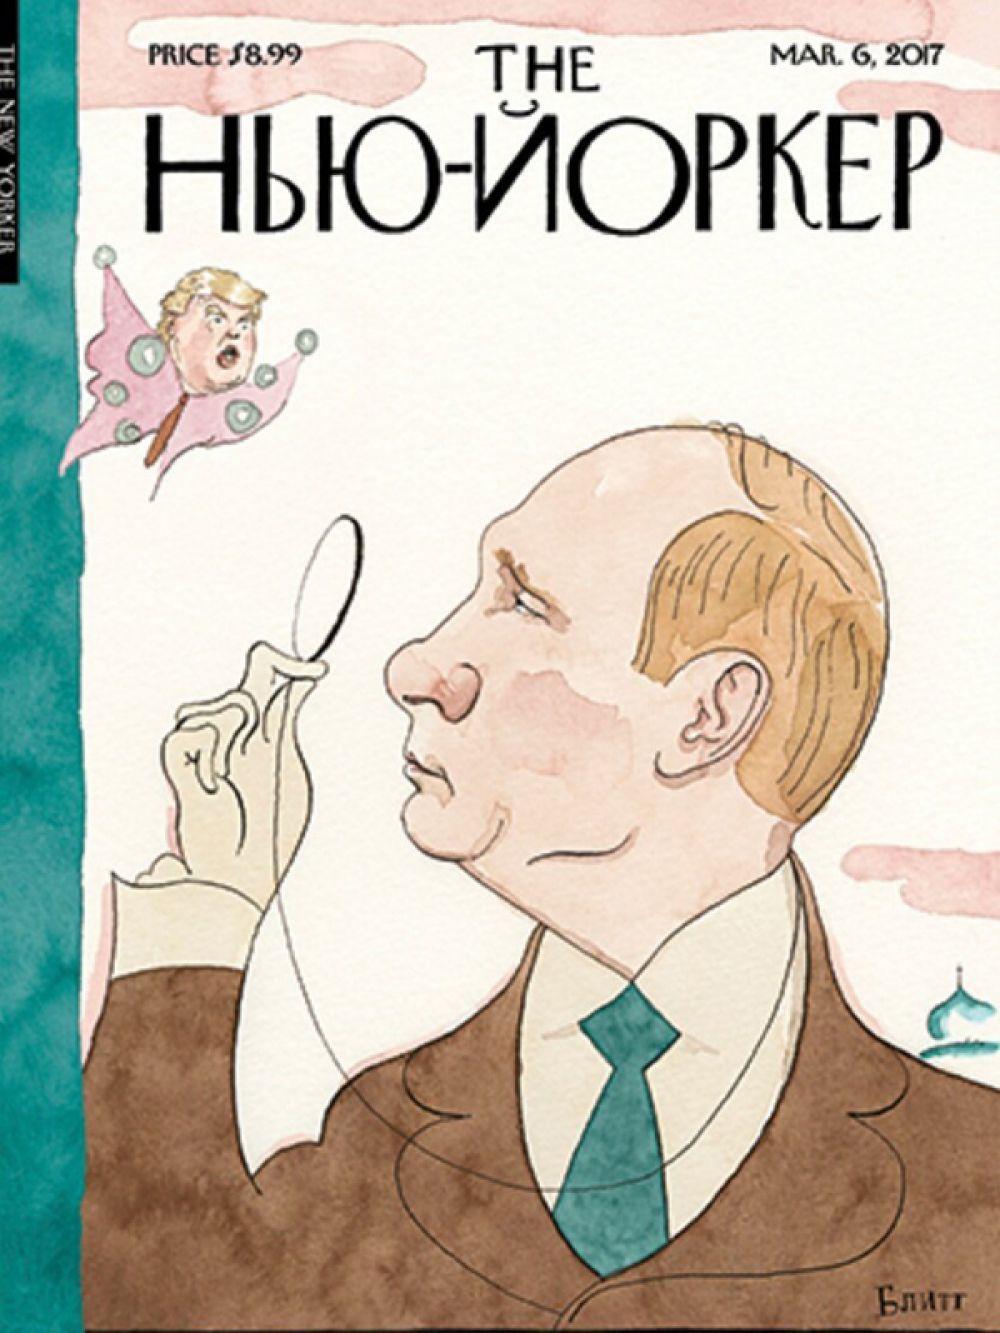 The New Yorker, март 2017 года.